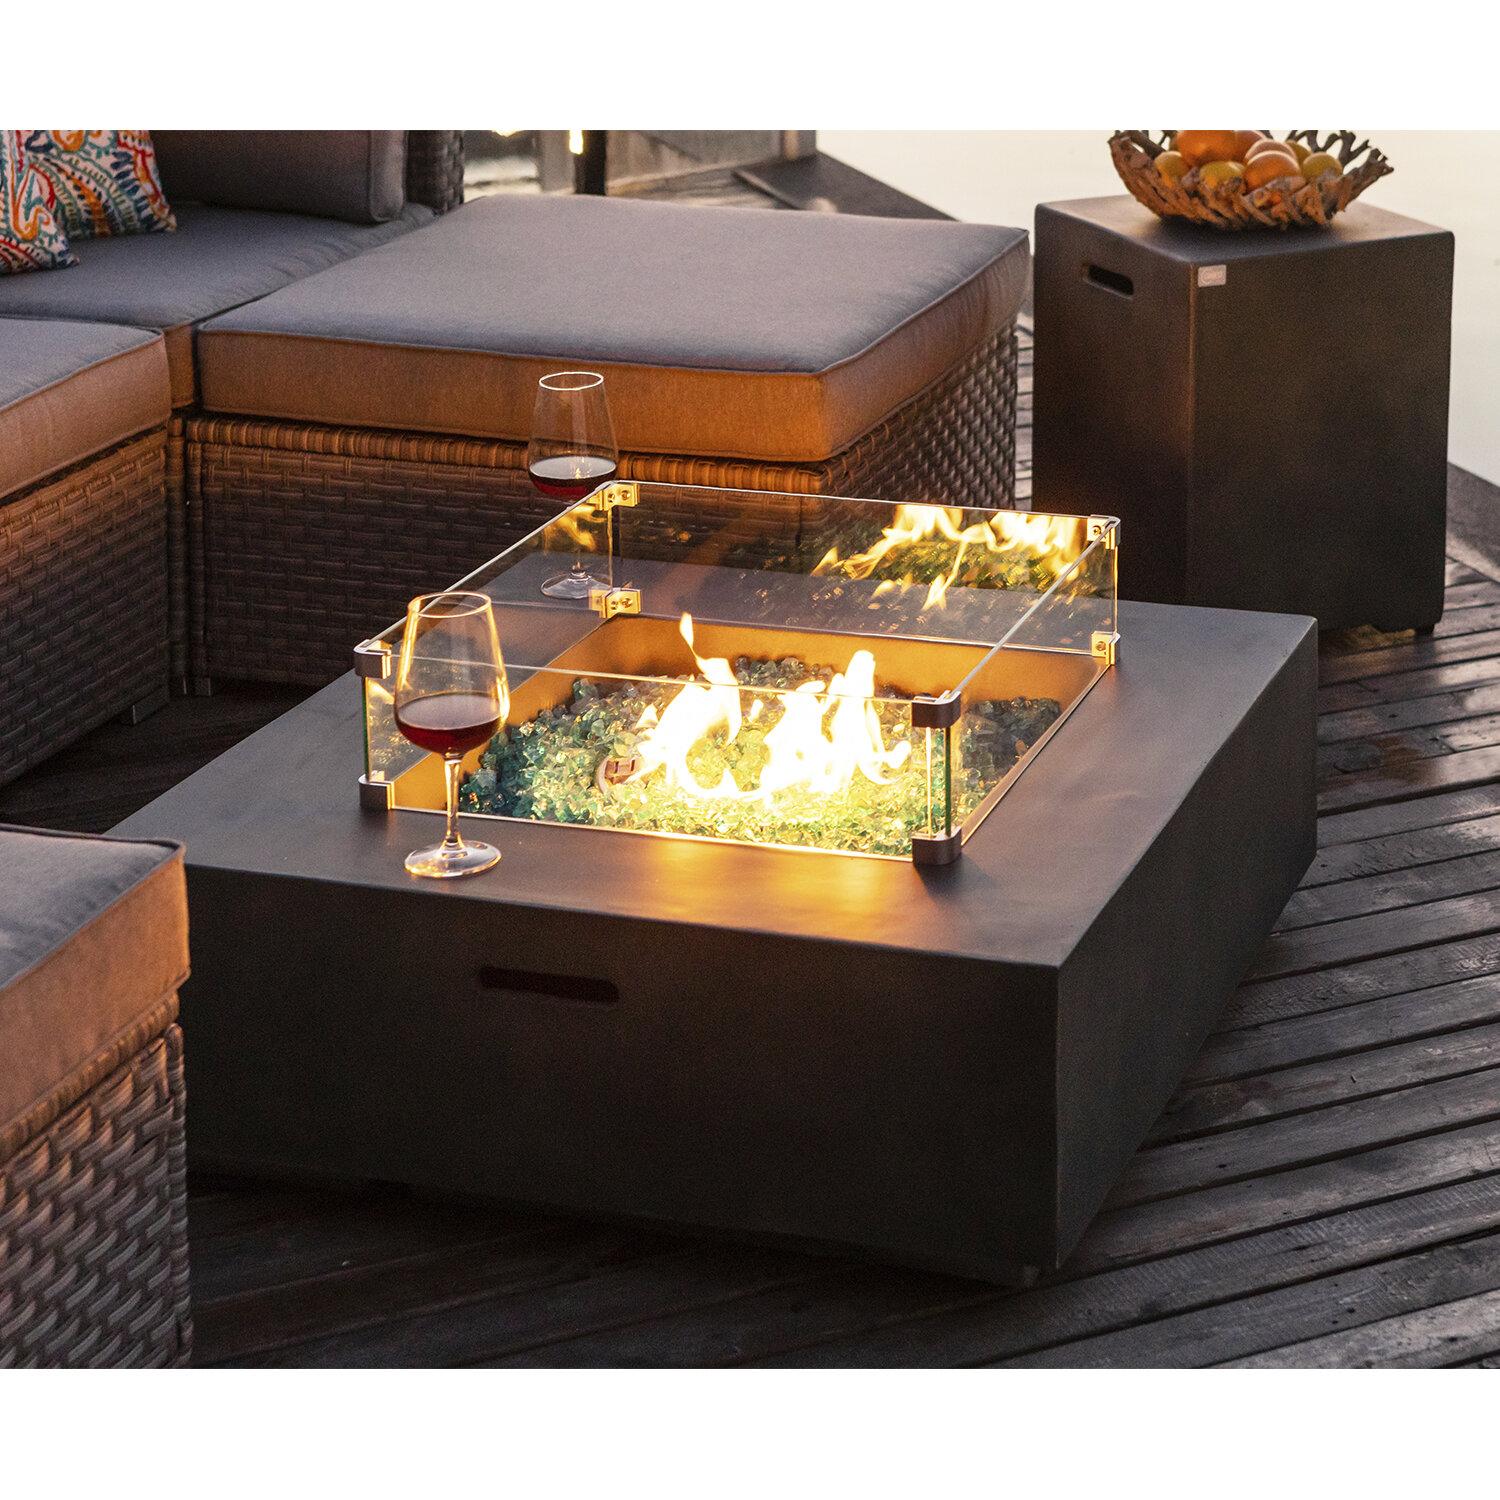 17 Stories Lechlade Concrete Propane Fire Pit Table Reviews Wayfair